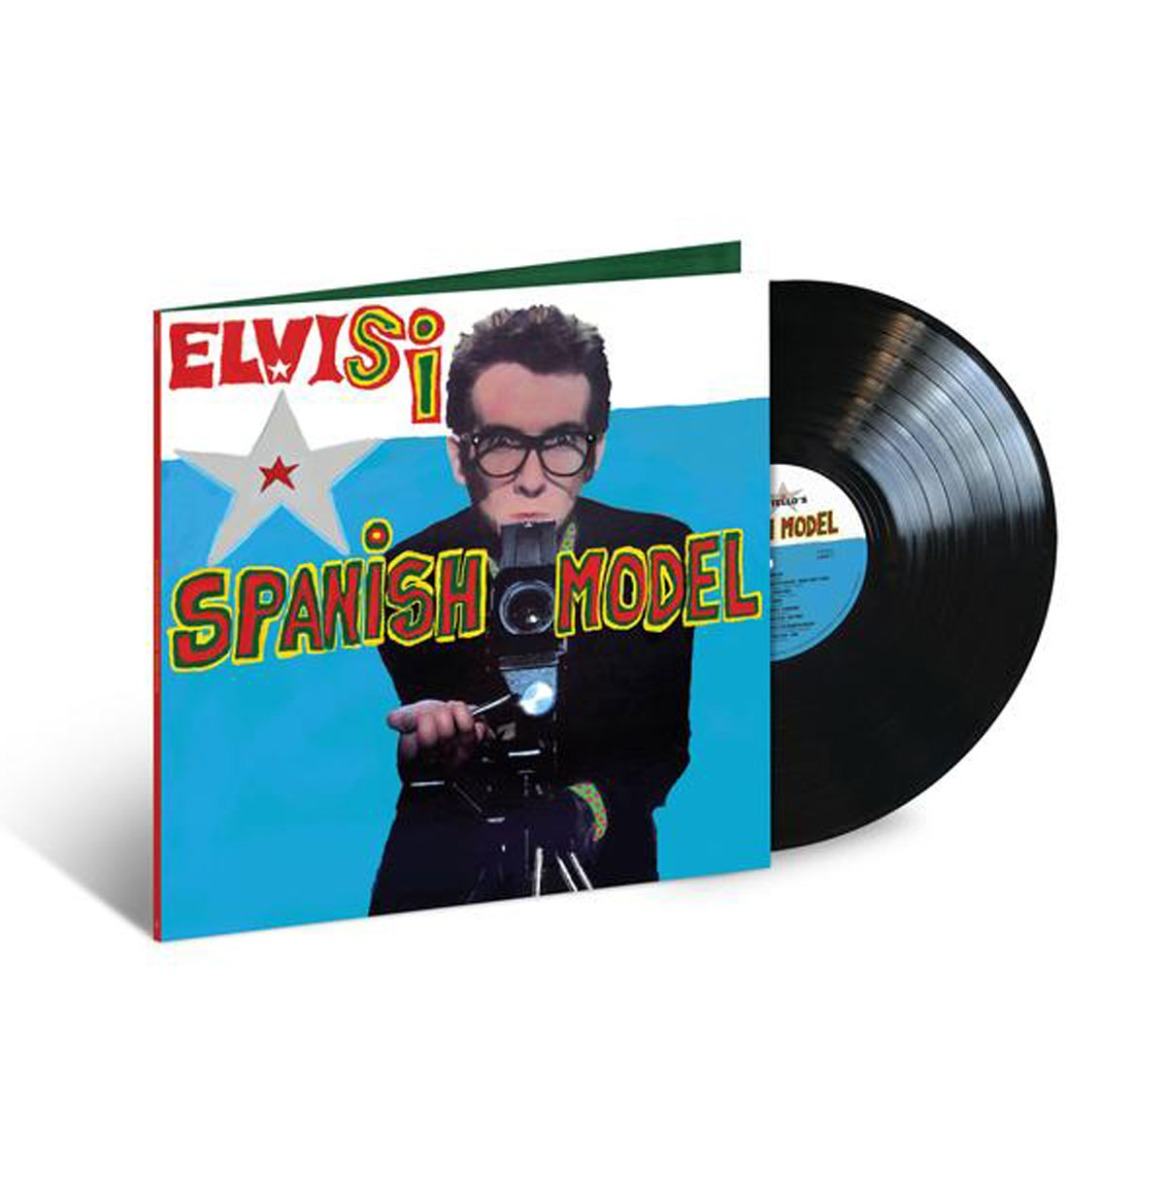 Elvis Costello & The Attractions - Spanish Model LP